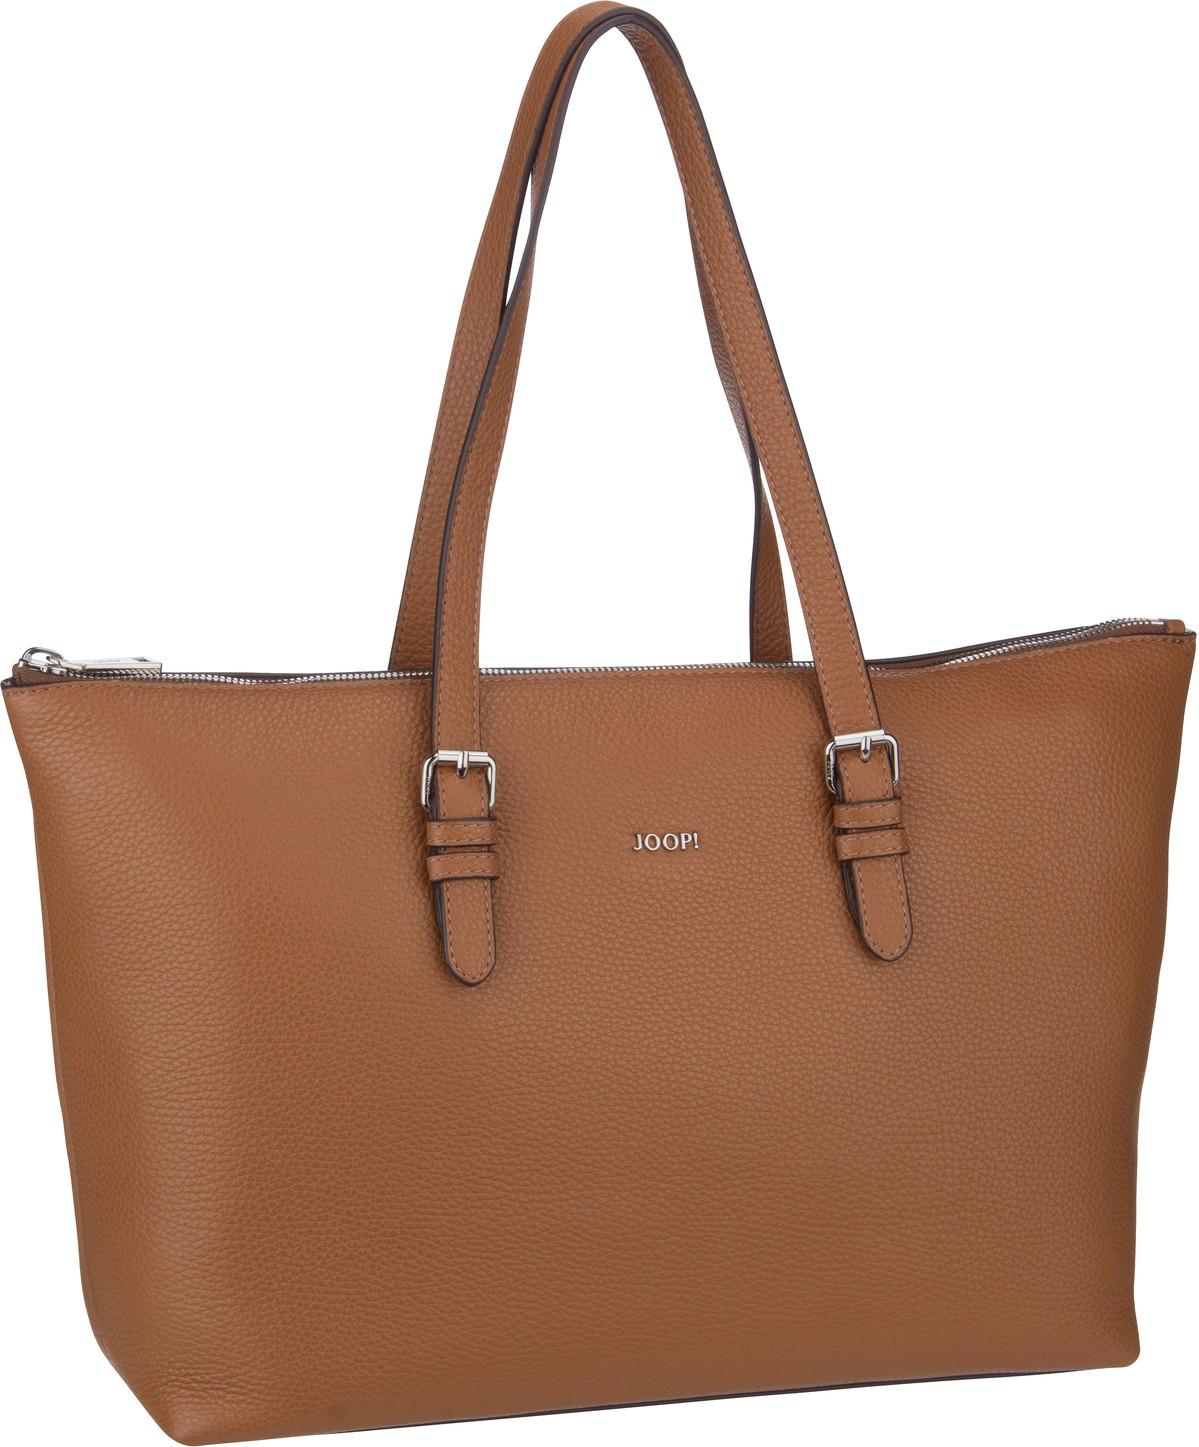 Handtasche Chiara Marla Shopper LHZ Cognac